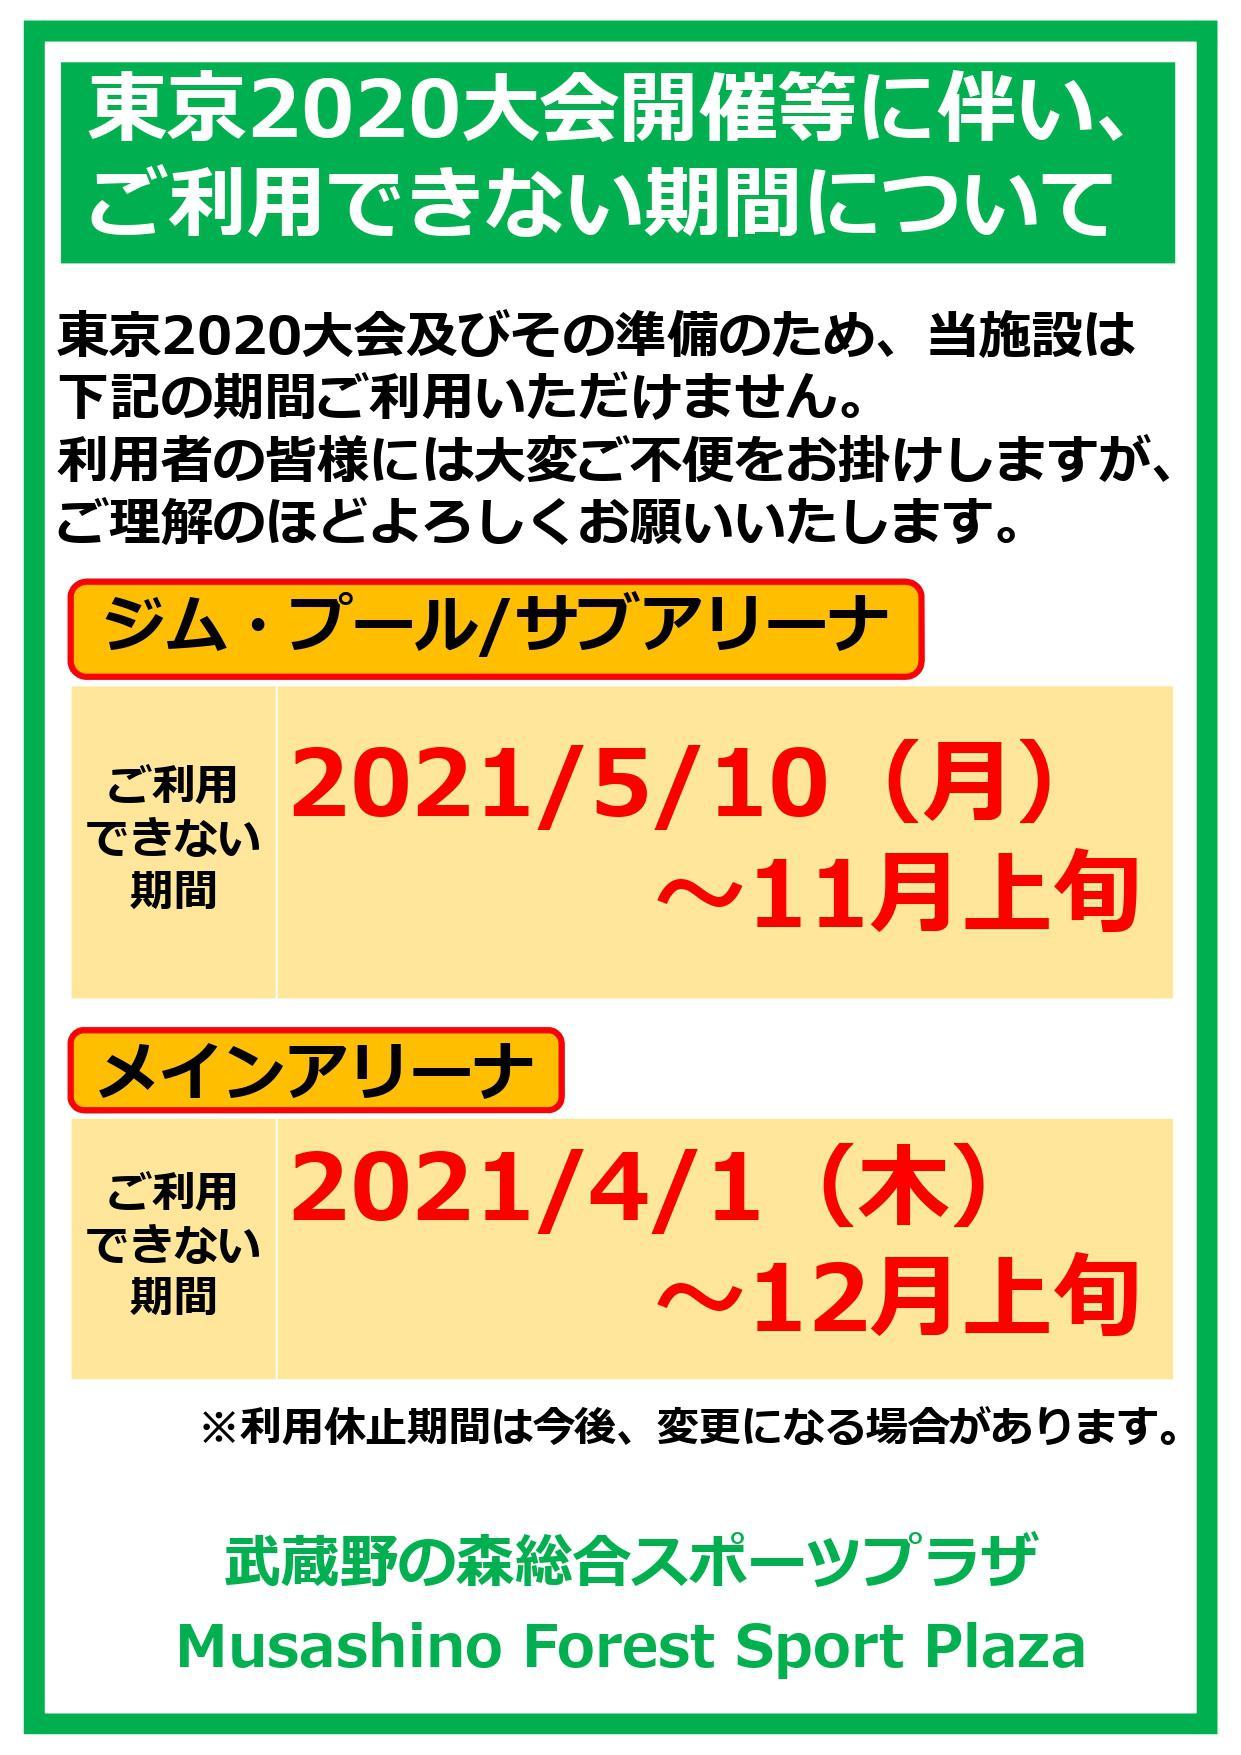 https://www.musamori-plaza.com/news/upload/ebadaf68d59febf38445c911ee8c67abb2ffe713.jpg